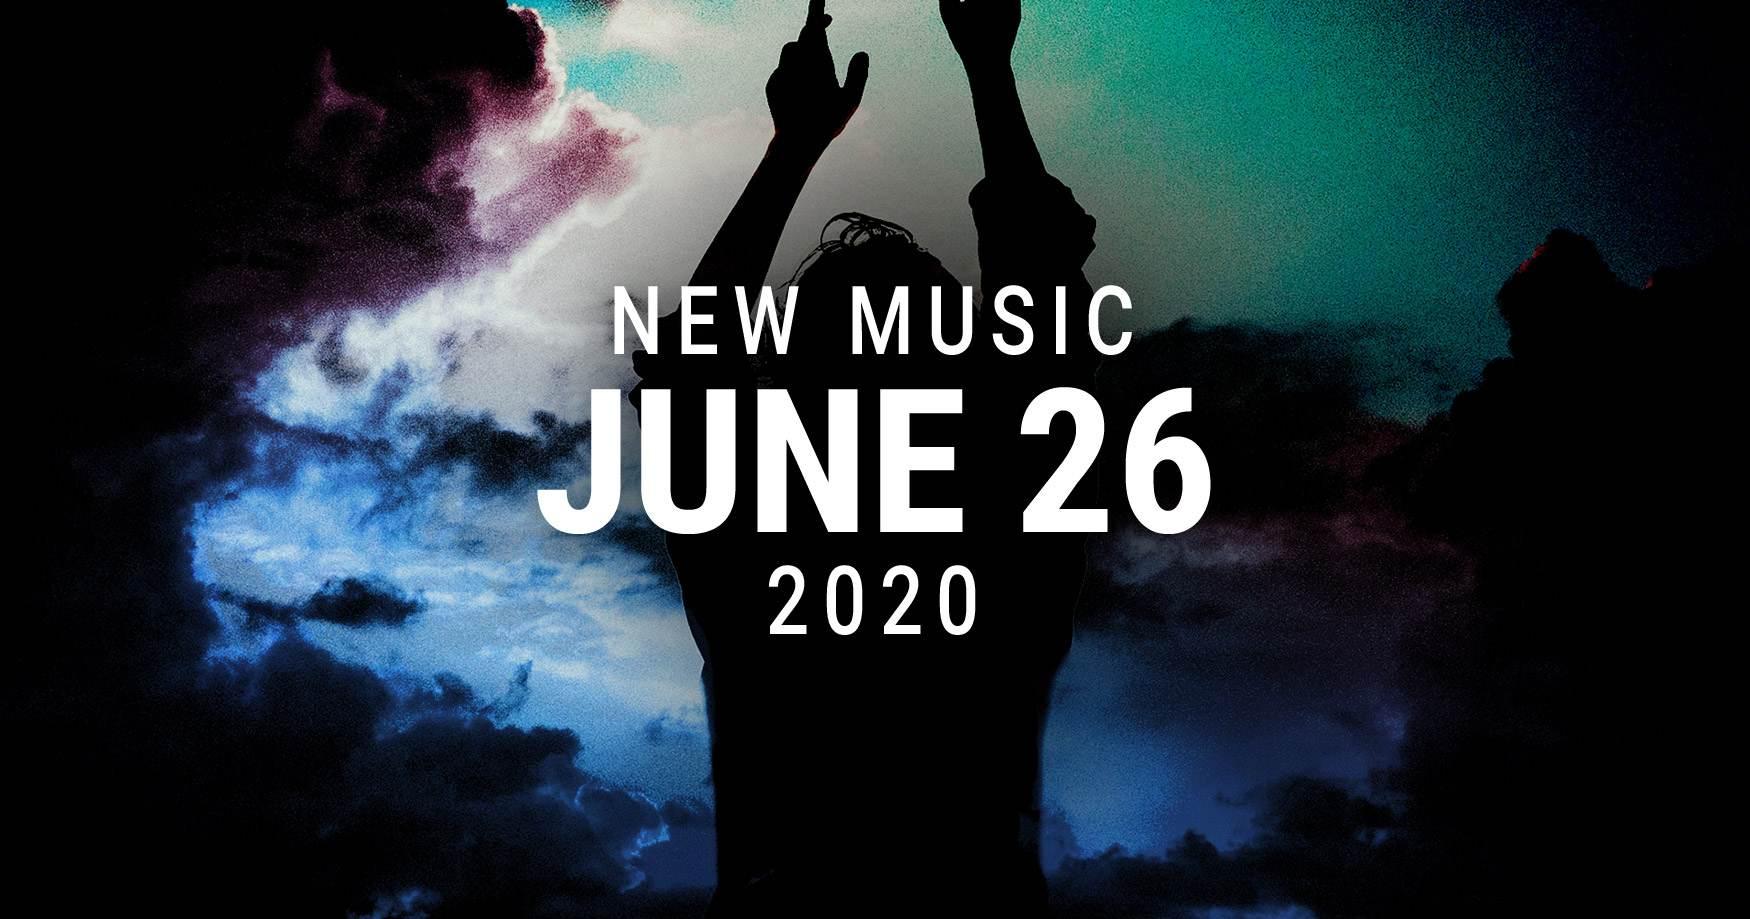 New Music June 26 2020